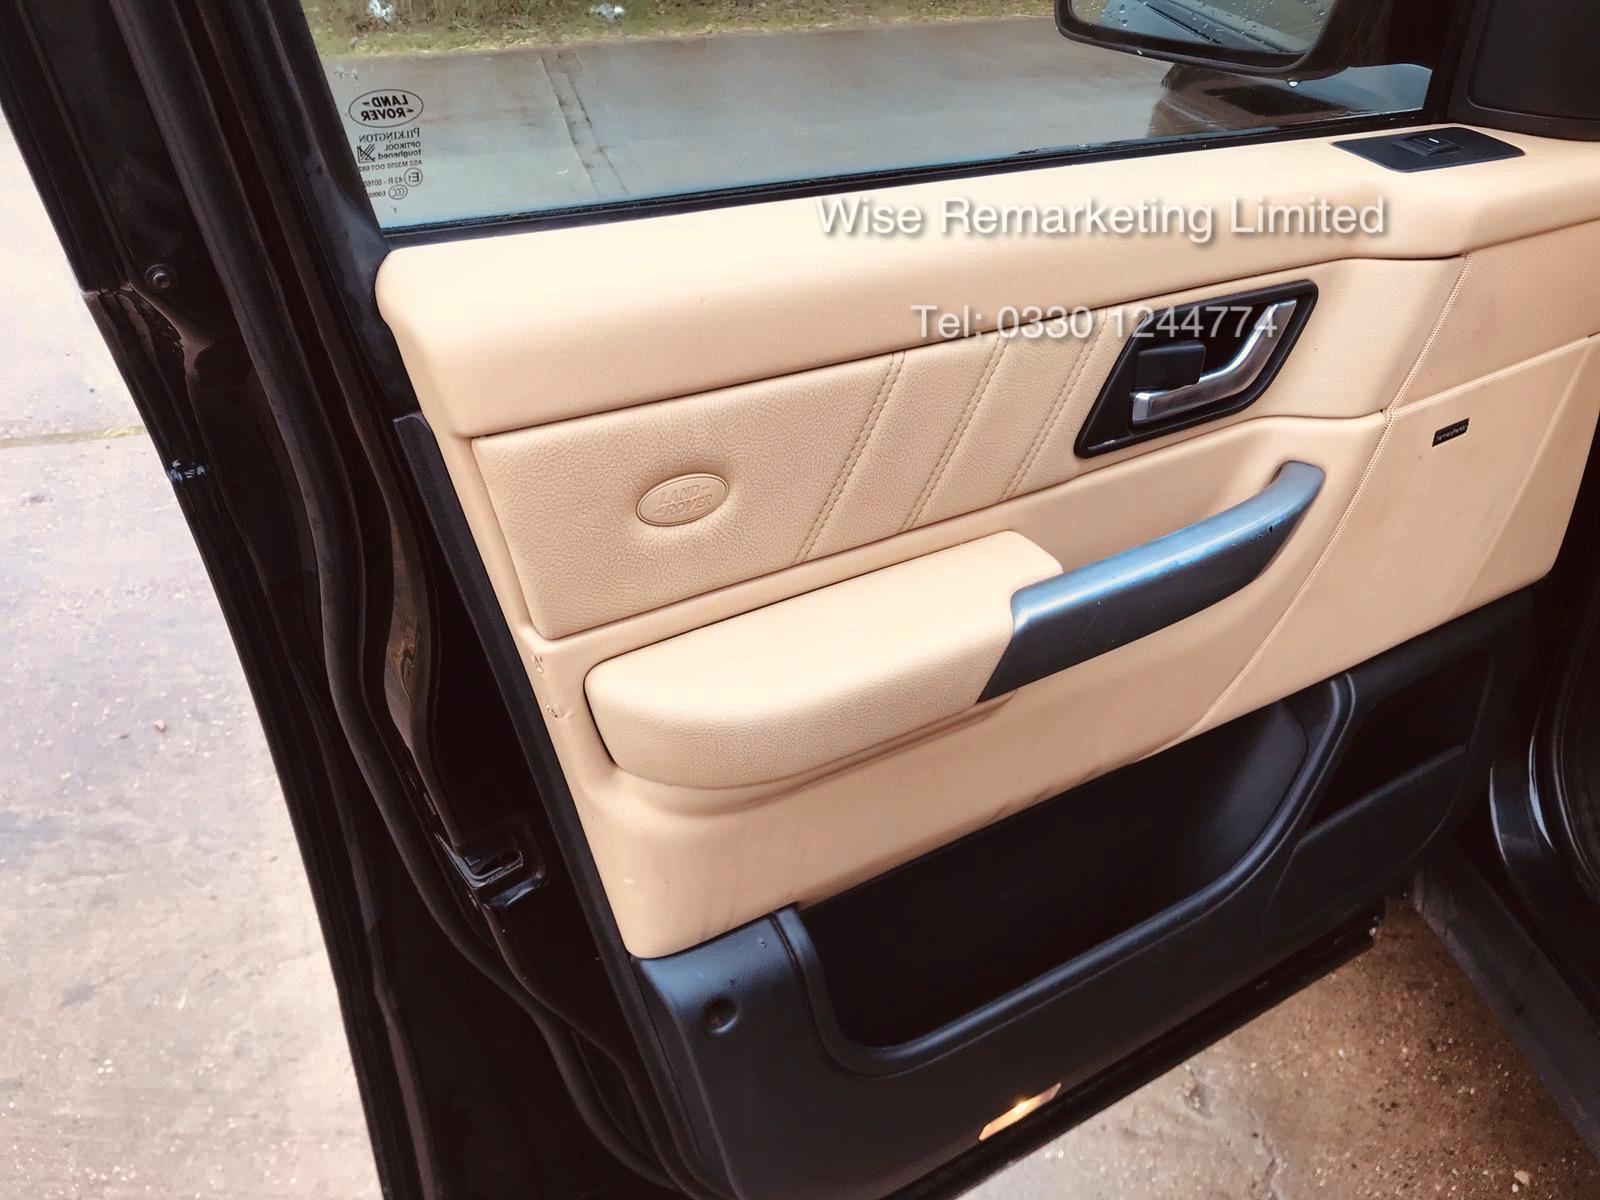 Range Rover Sport 2.7 TDV6 HSE Auto - 2008 Model - Cream Leather - Sat Nav - Heated Seats - Image 15 of 19